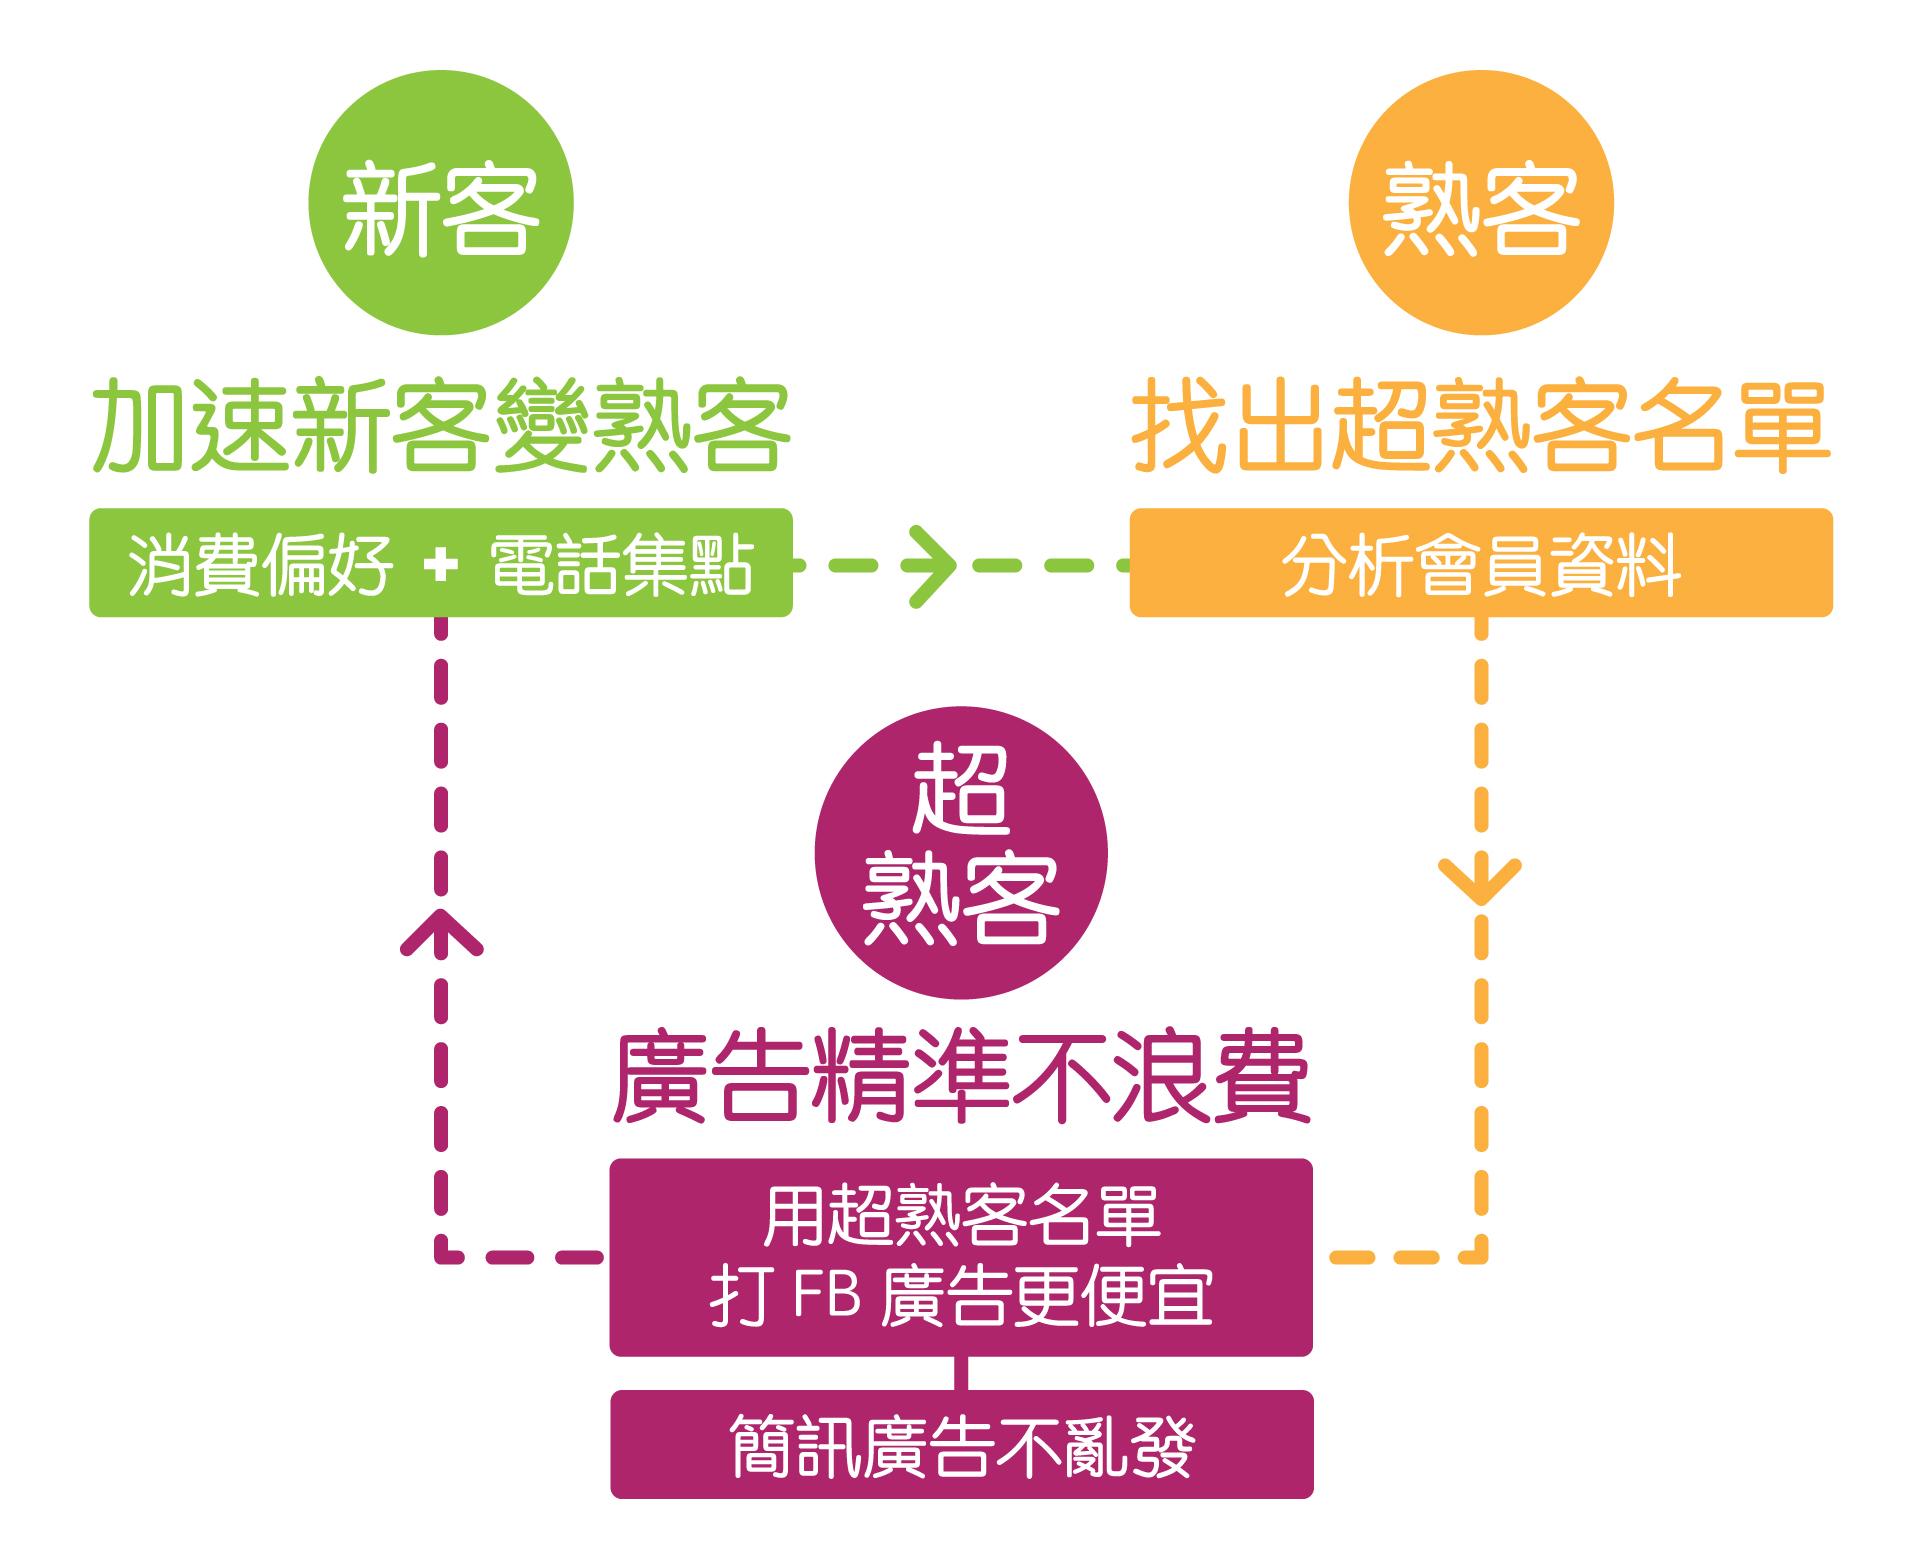 iCHEF POS 招客系統循環,報電話就可以在POS上做會員管理,讓你新客變熟客、熟客帶新客,來客源源不絕。